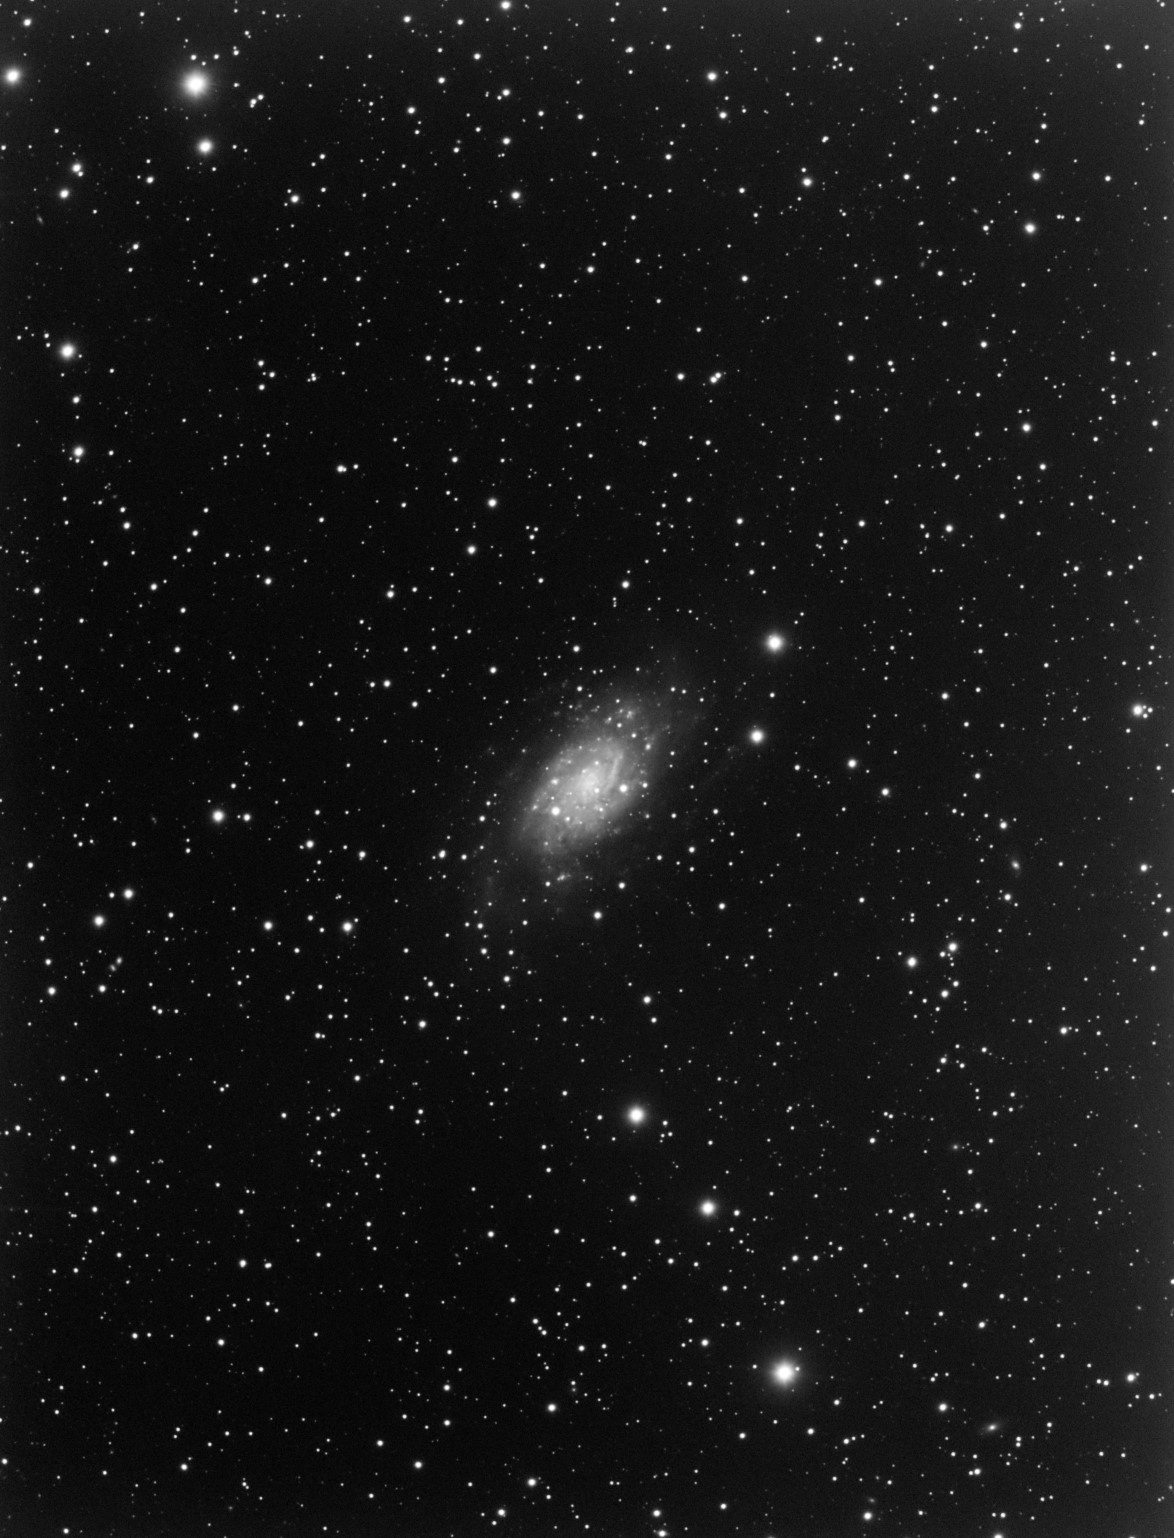 NGC2403.jpg.12f91734c97571c361cc5c7385d14a73.jpg